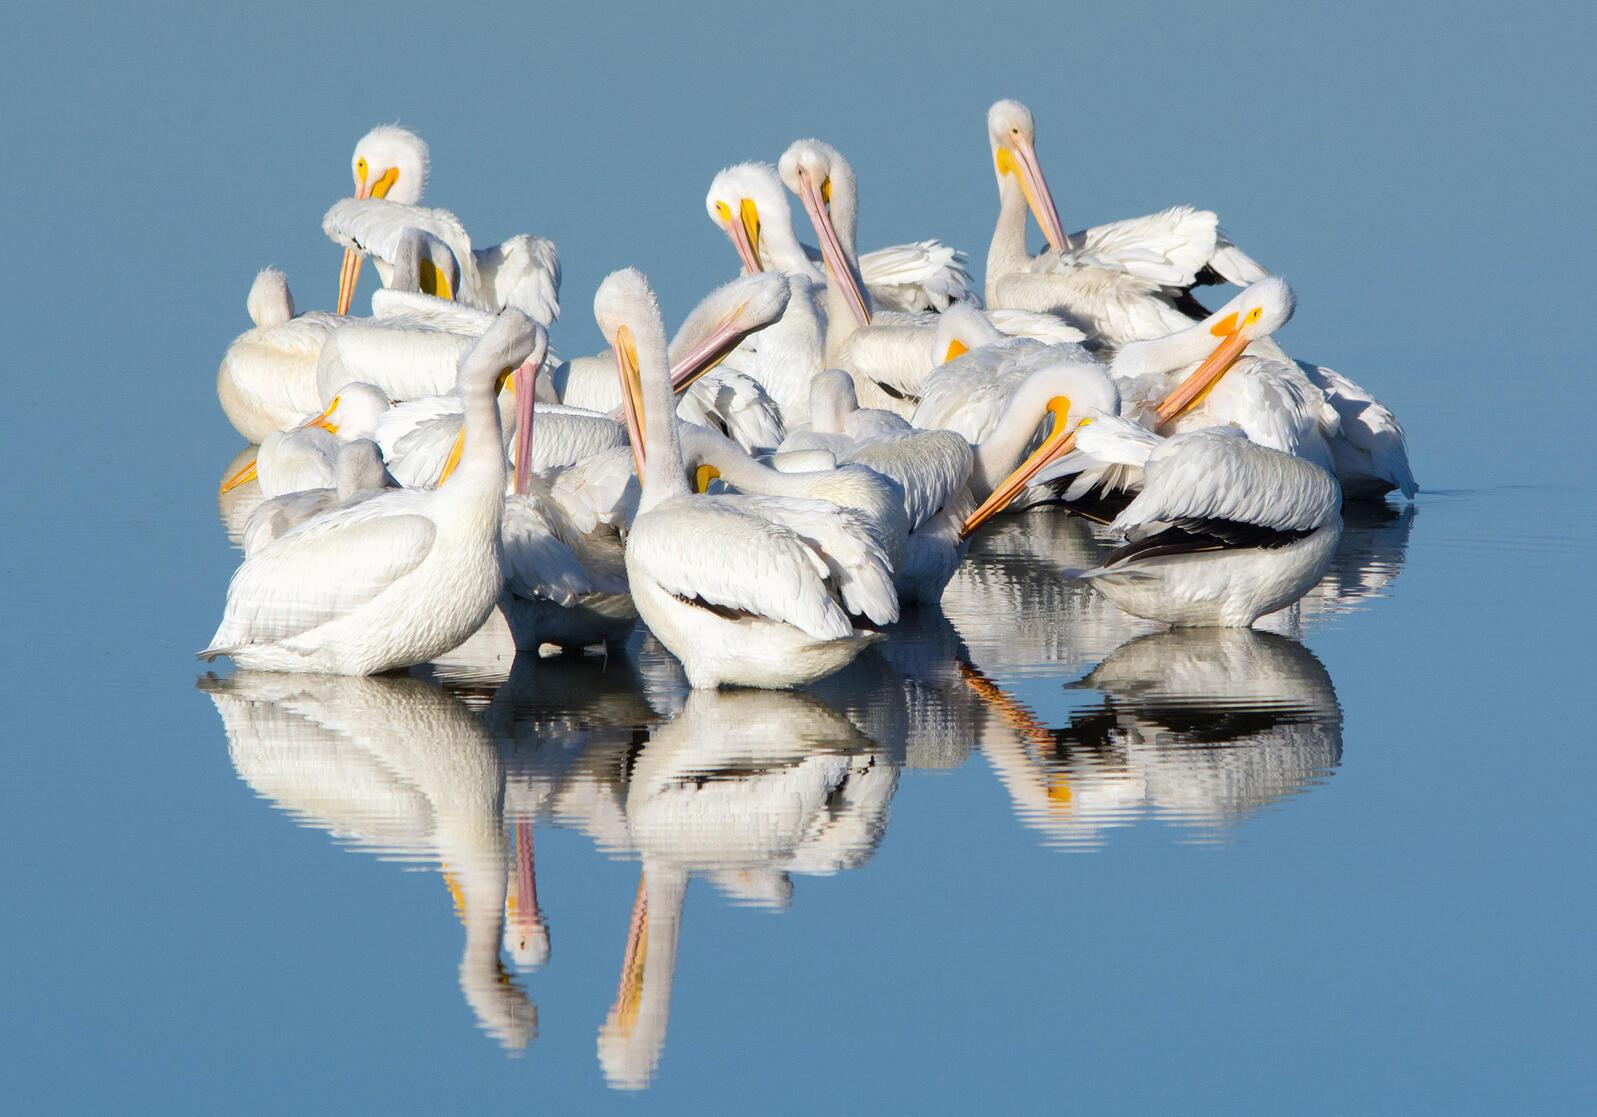 American White Pelicans. Georgia Wilson/Great Backyard Bird Count